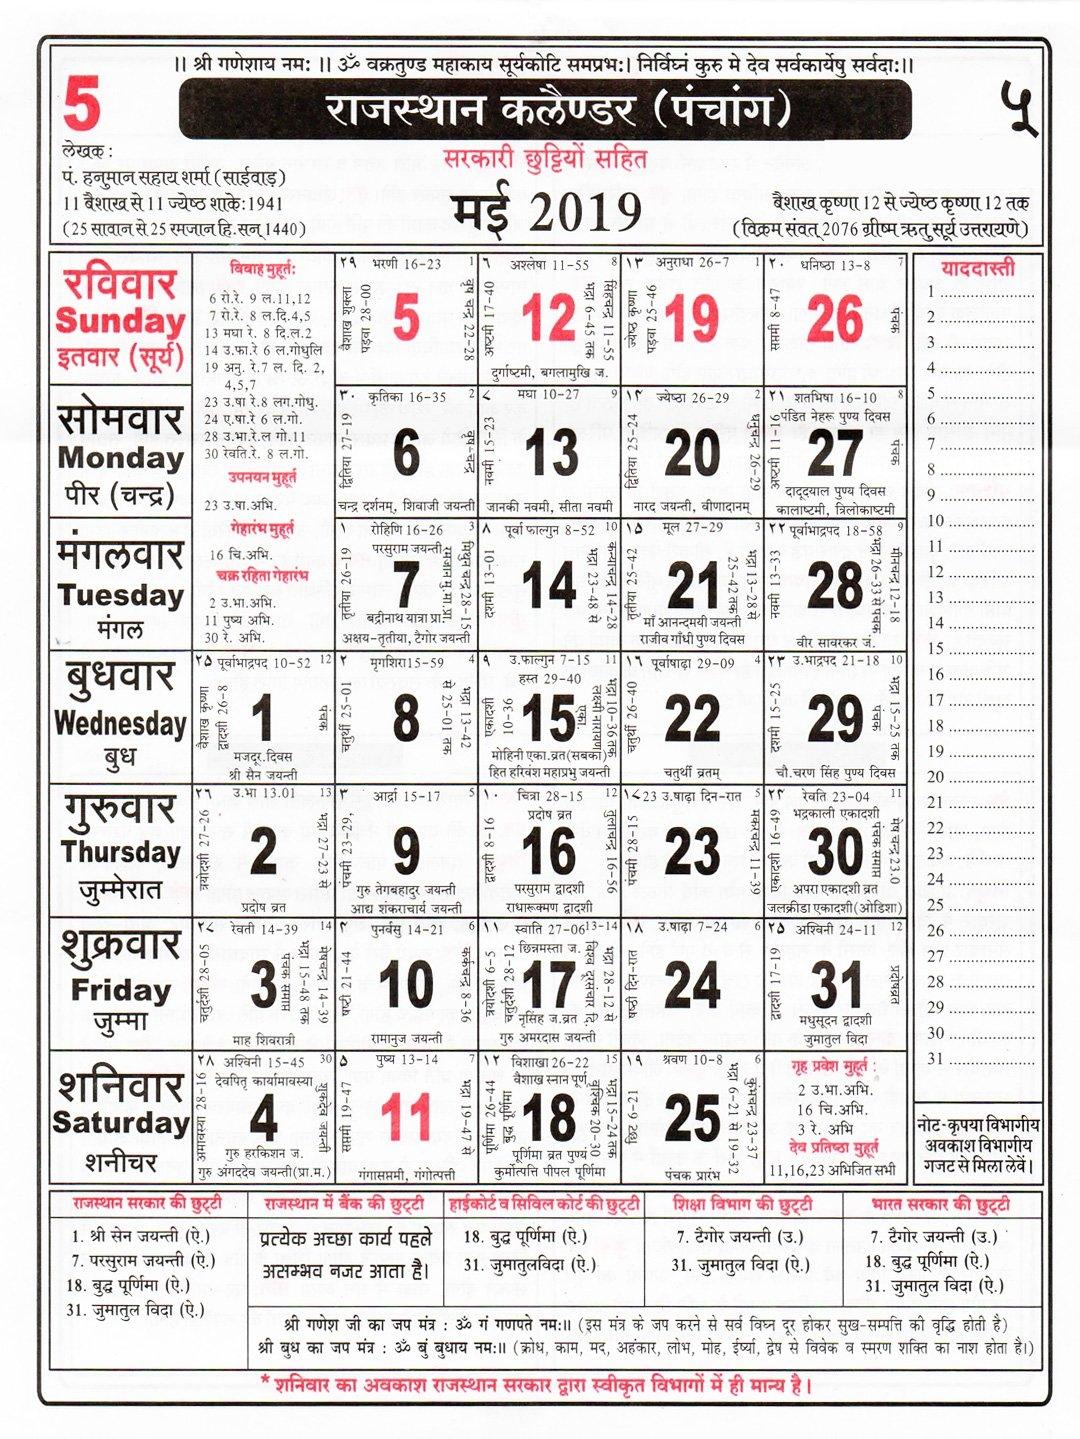 Rajasthan Calendar May 2019 | 2017Mobilecalendars Calendar 2019 Rajasthan